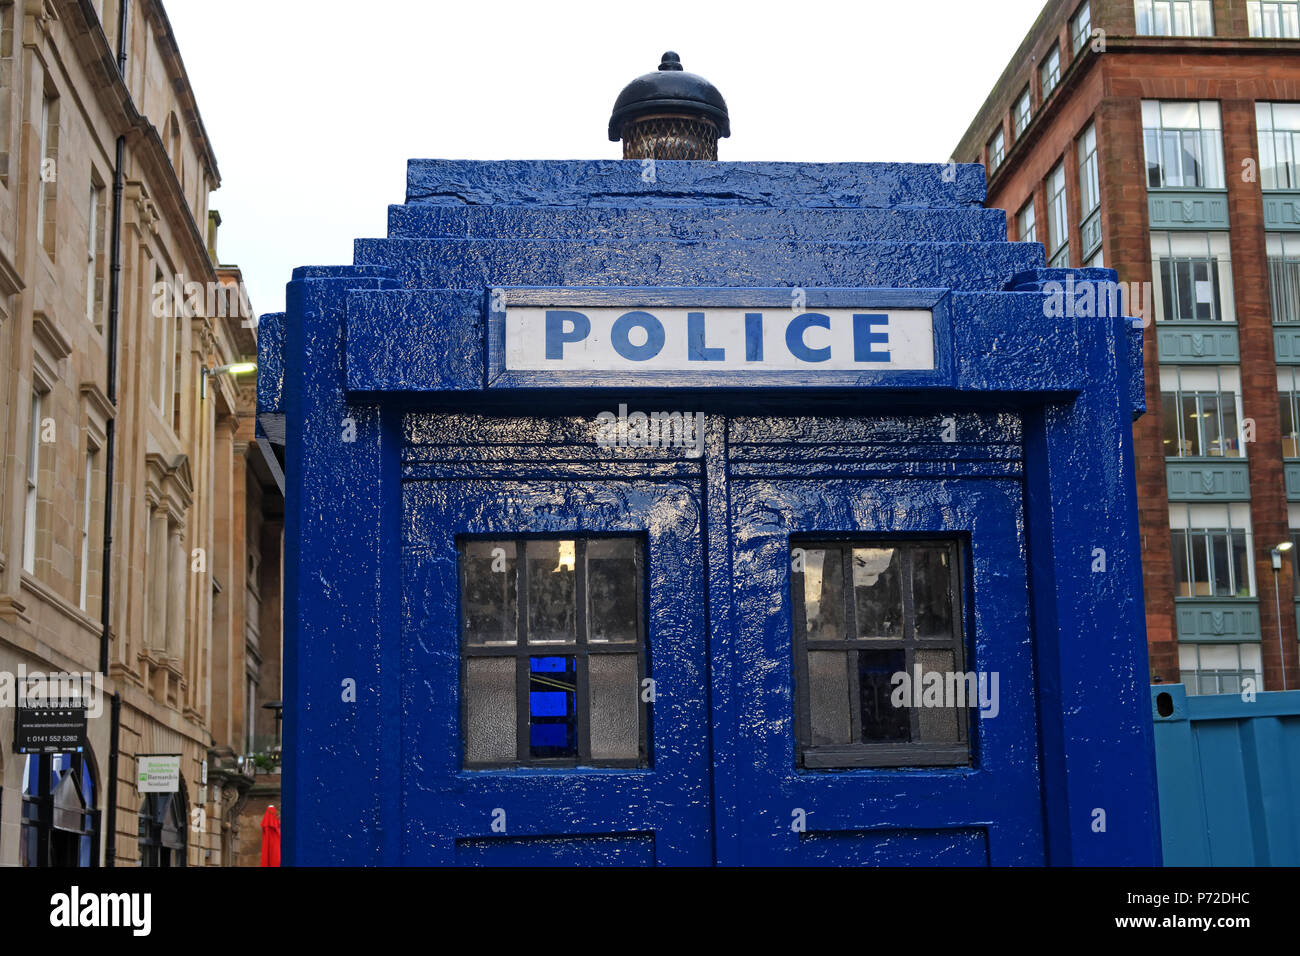 HotpixUK,GoTonySmith,police